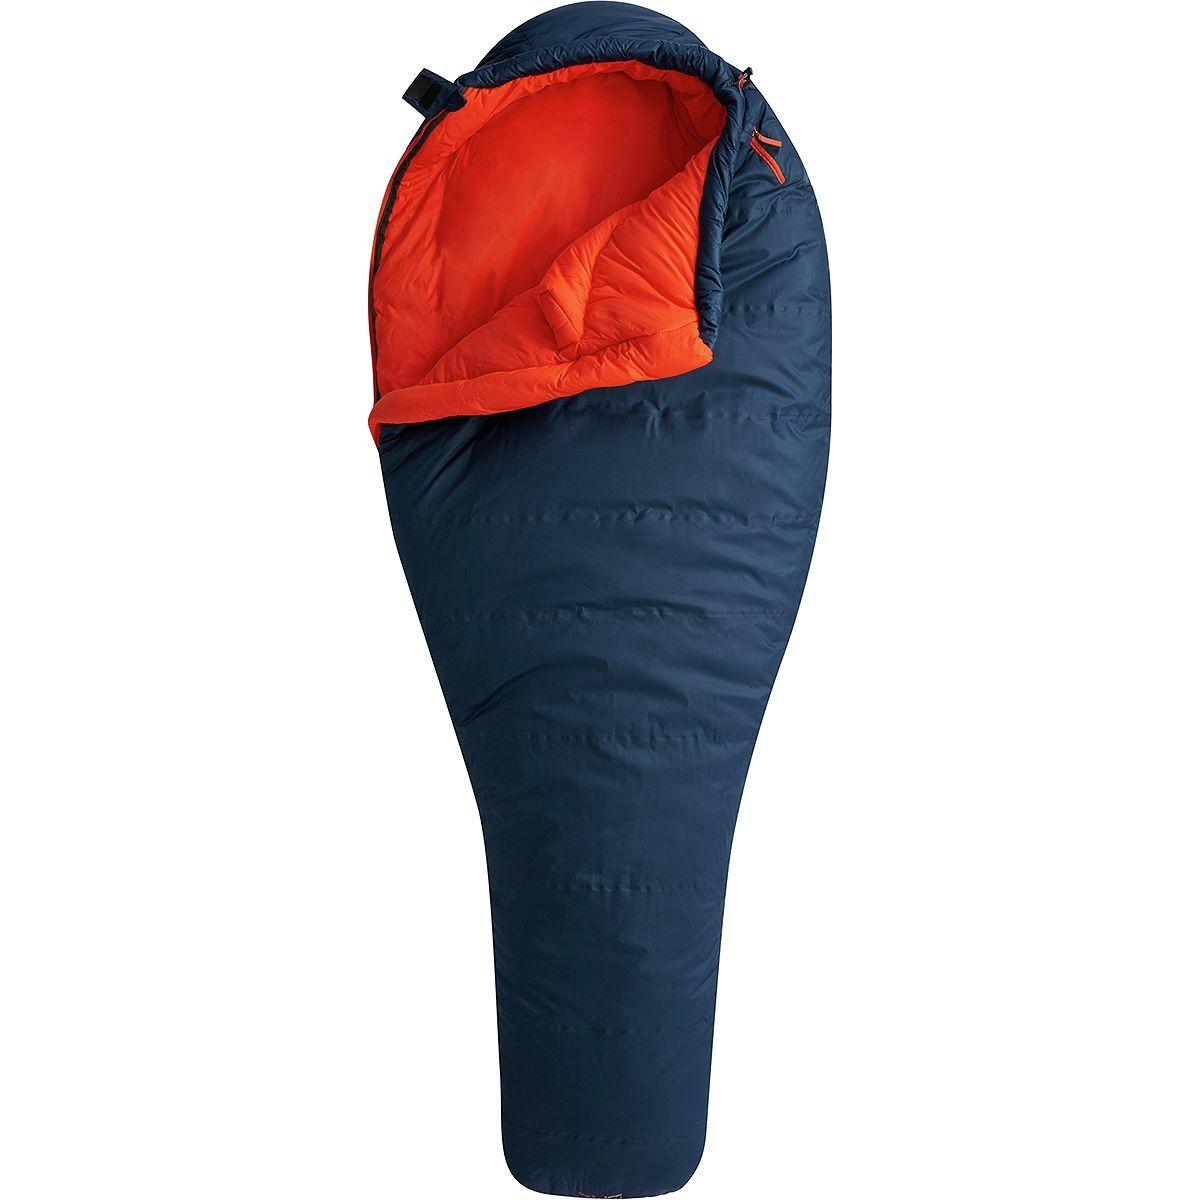 Mountain Hardwear Laminina Z Sleeping Bag: 0 Degree Synthetic - Women's